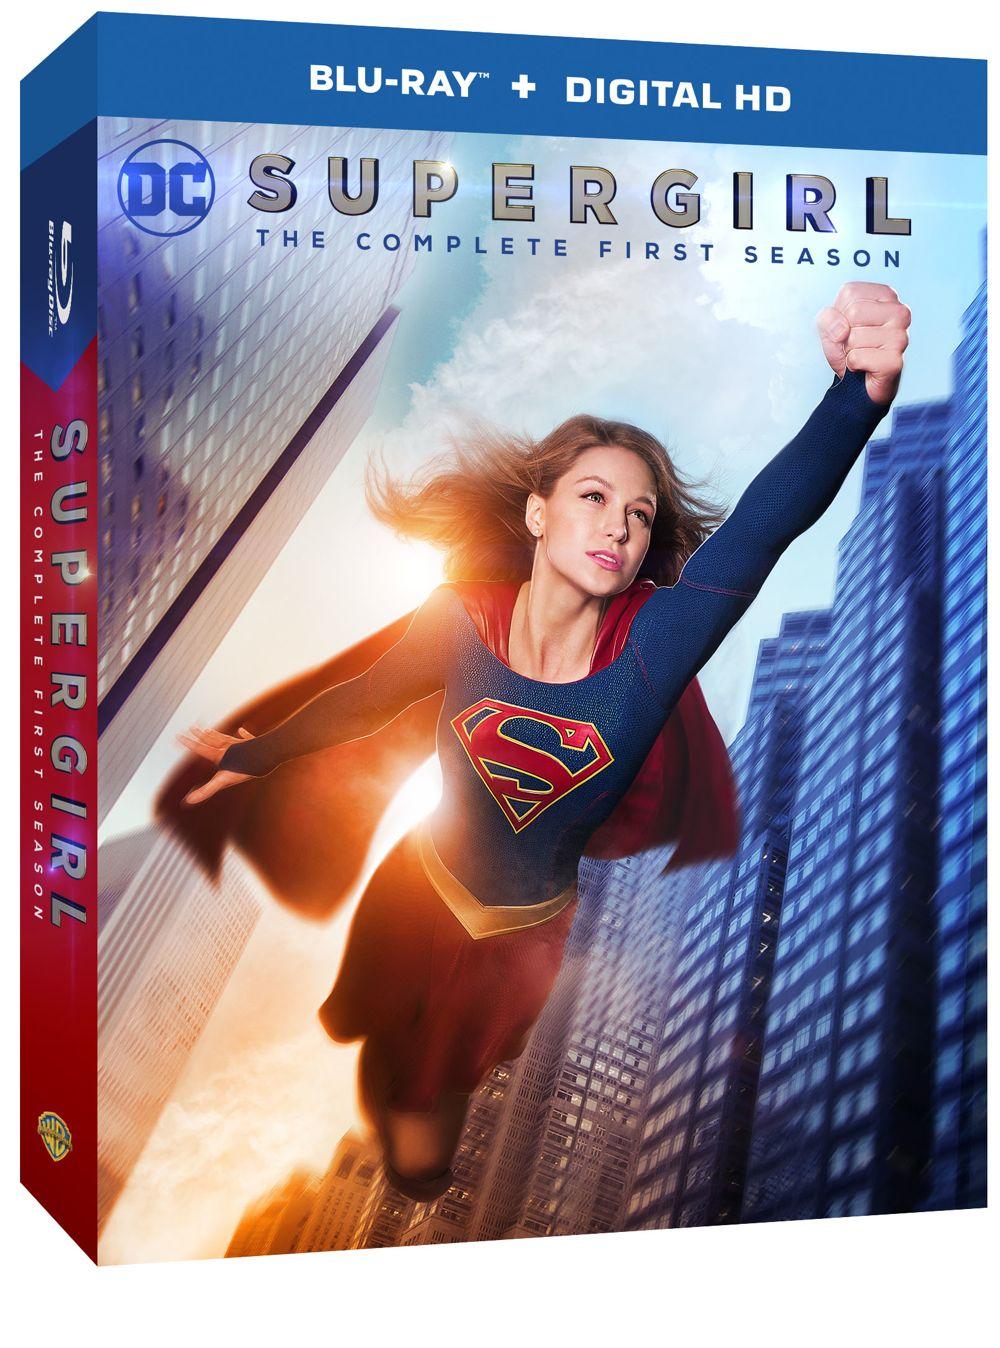 Supergirl Season 1 Bluray - 4